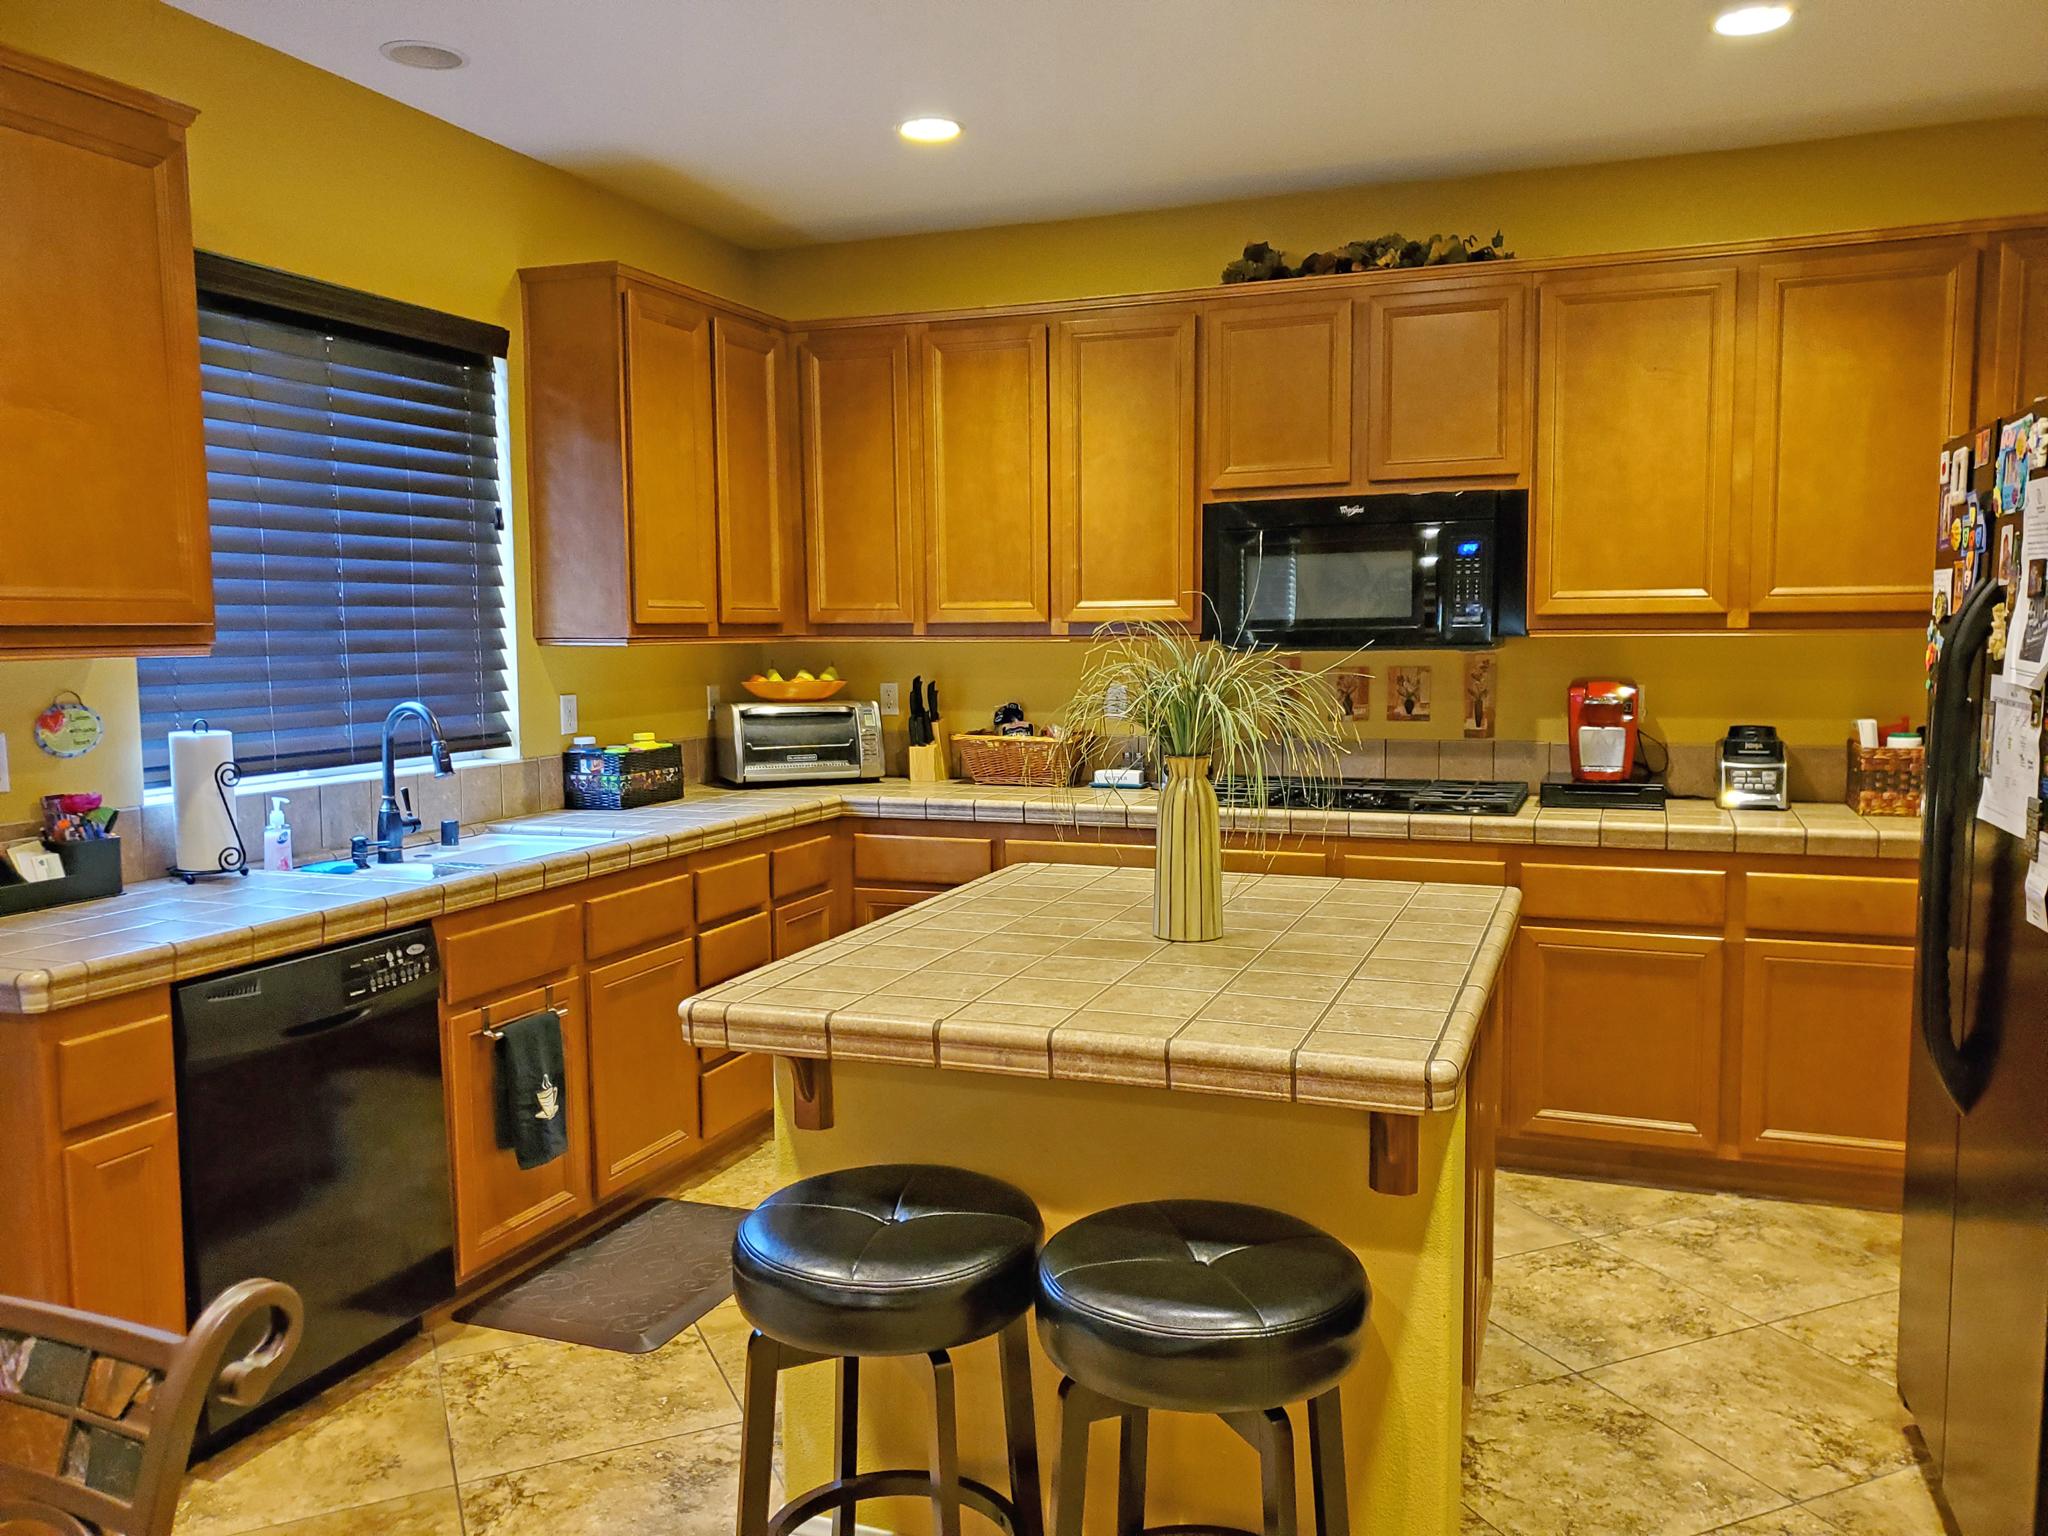 124 Boston Ave., Beaumont Ca 92223 Kitchen